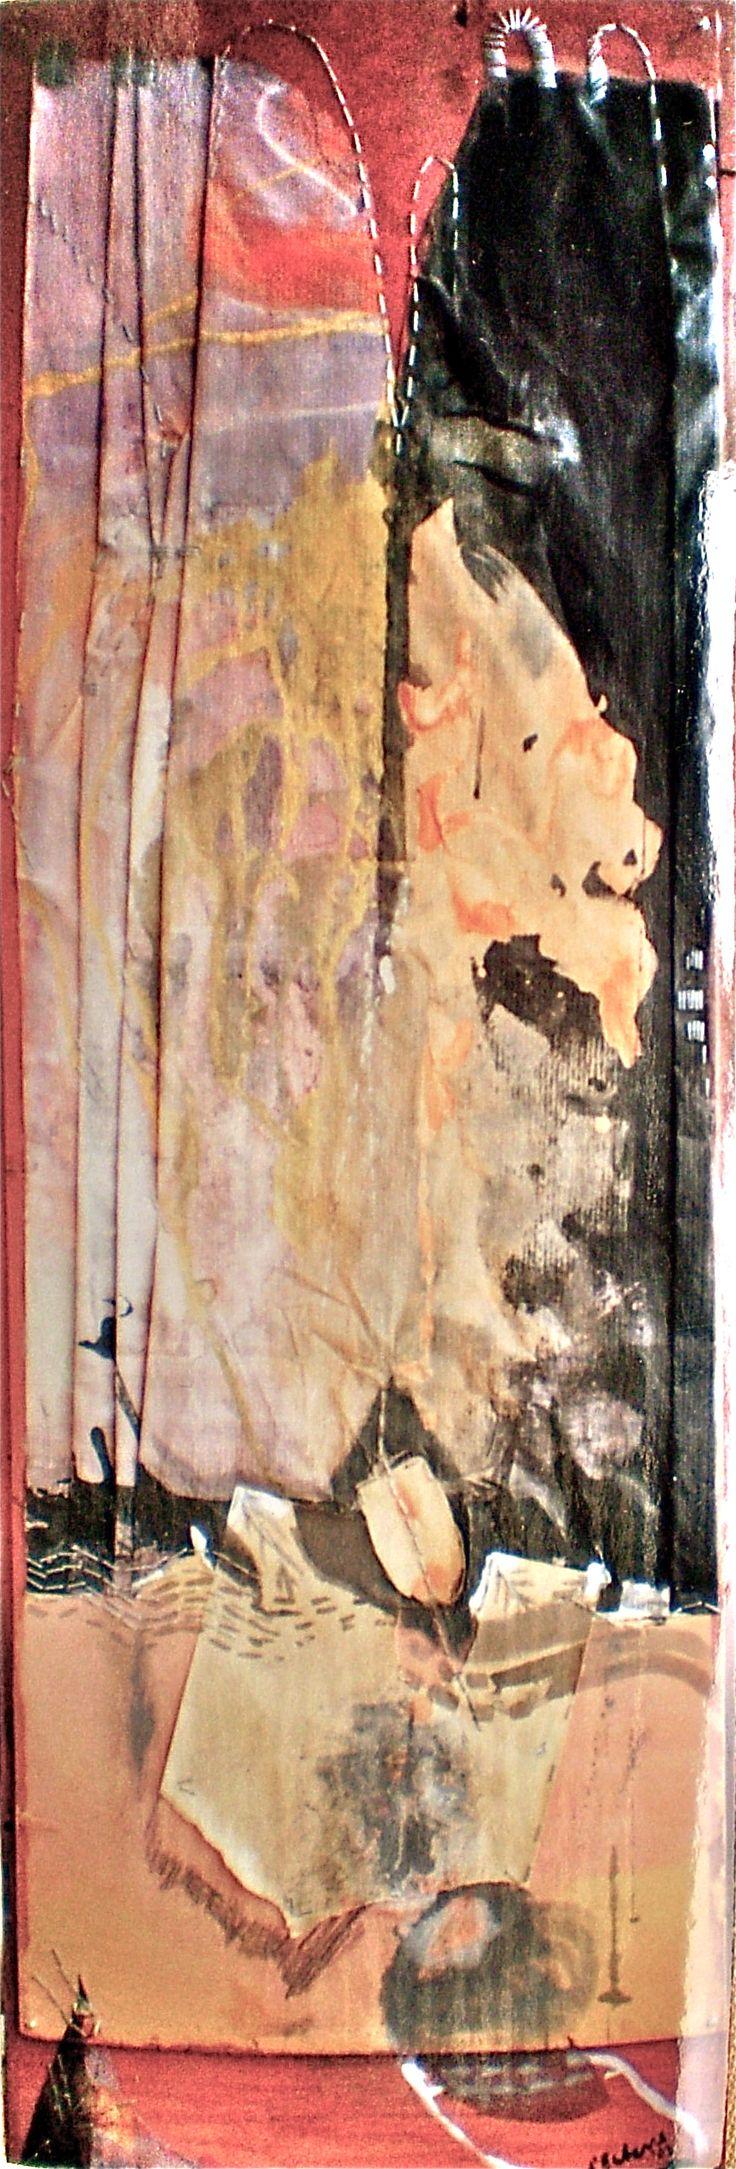 ELAINE d'ESTERRE - Rock Moves, 2002, pastel, ink, graphite and staples on gessoed board 150x50 cm by Elaine d'Esterre at http://elainedesterreart.com and http://www.facebook.com/elainedesterreart/ and http://instagram.com/desterreart/